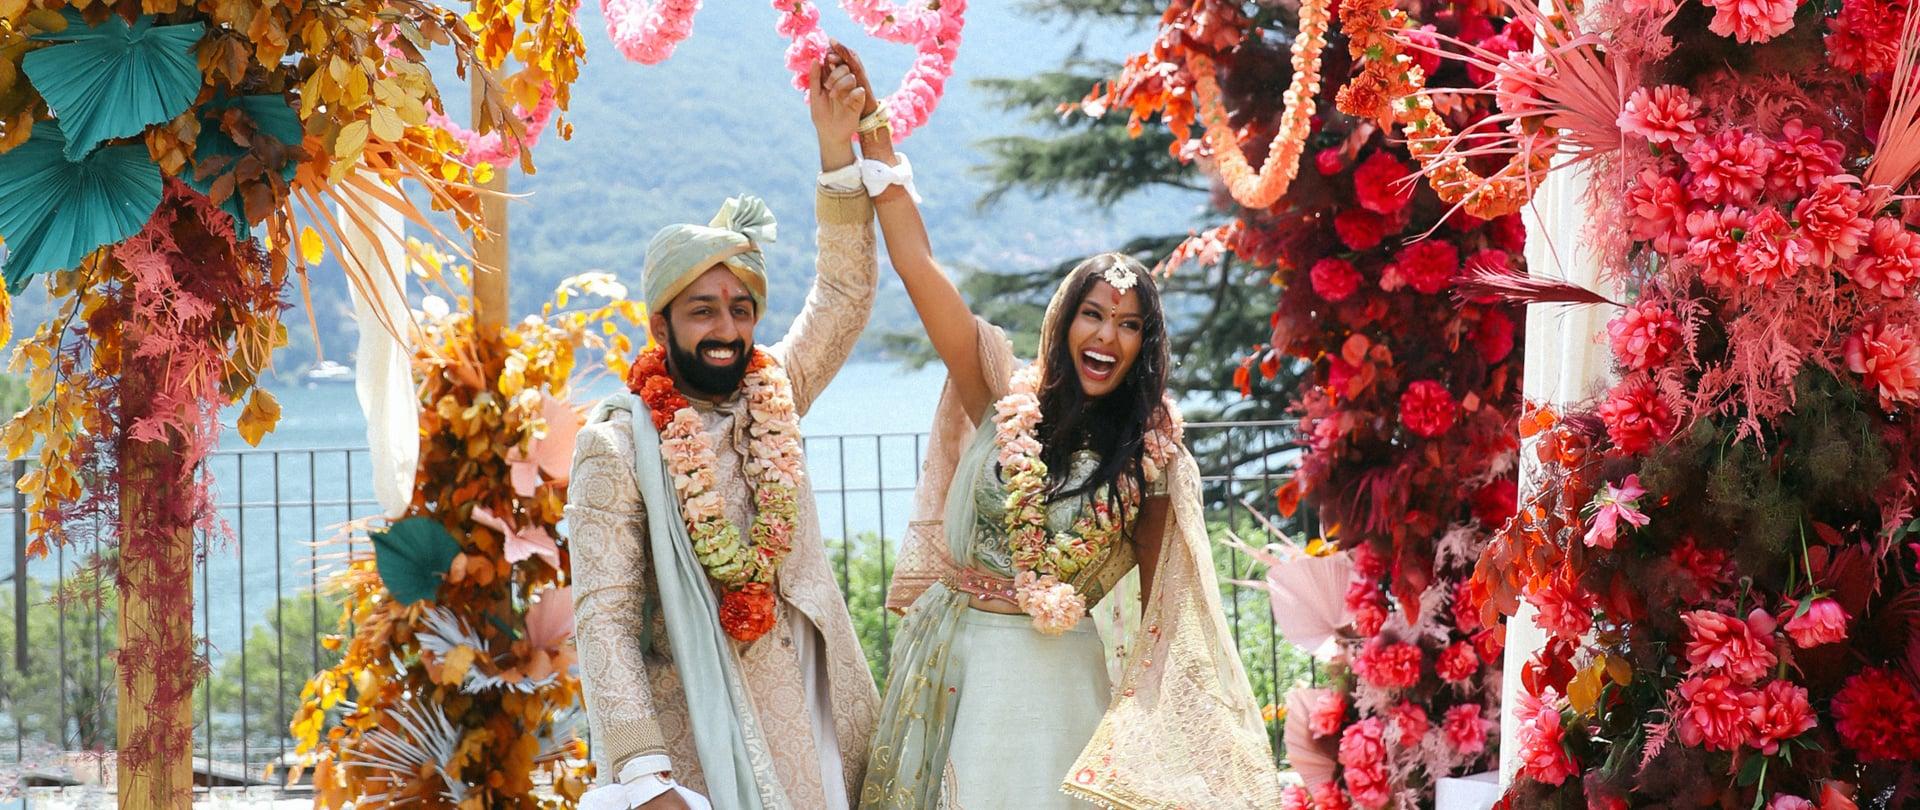 Neha & Shehryar Wedding Video Filmed at Lake Como, Italy